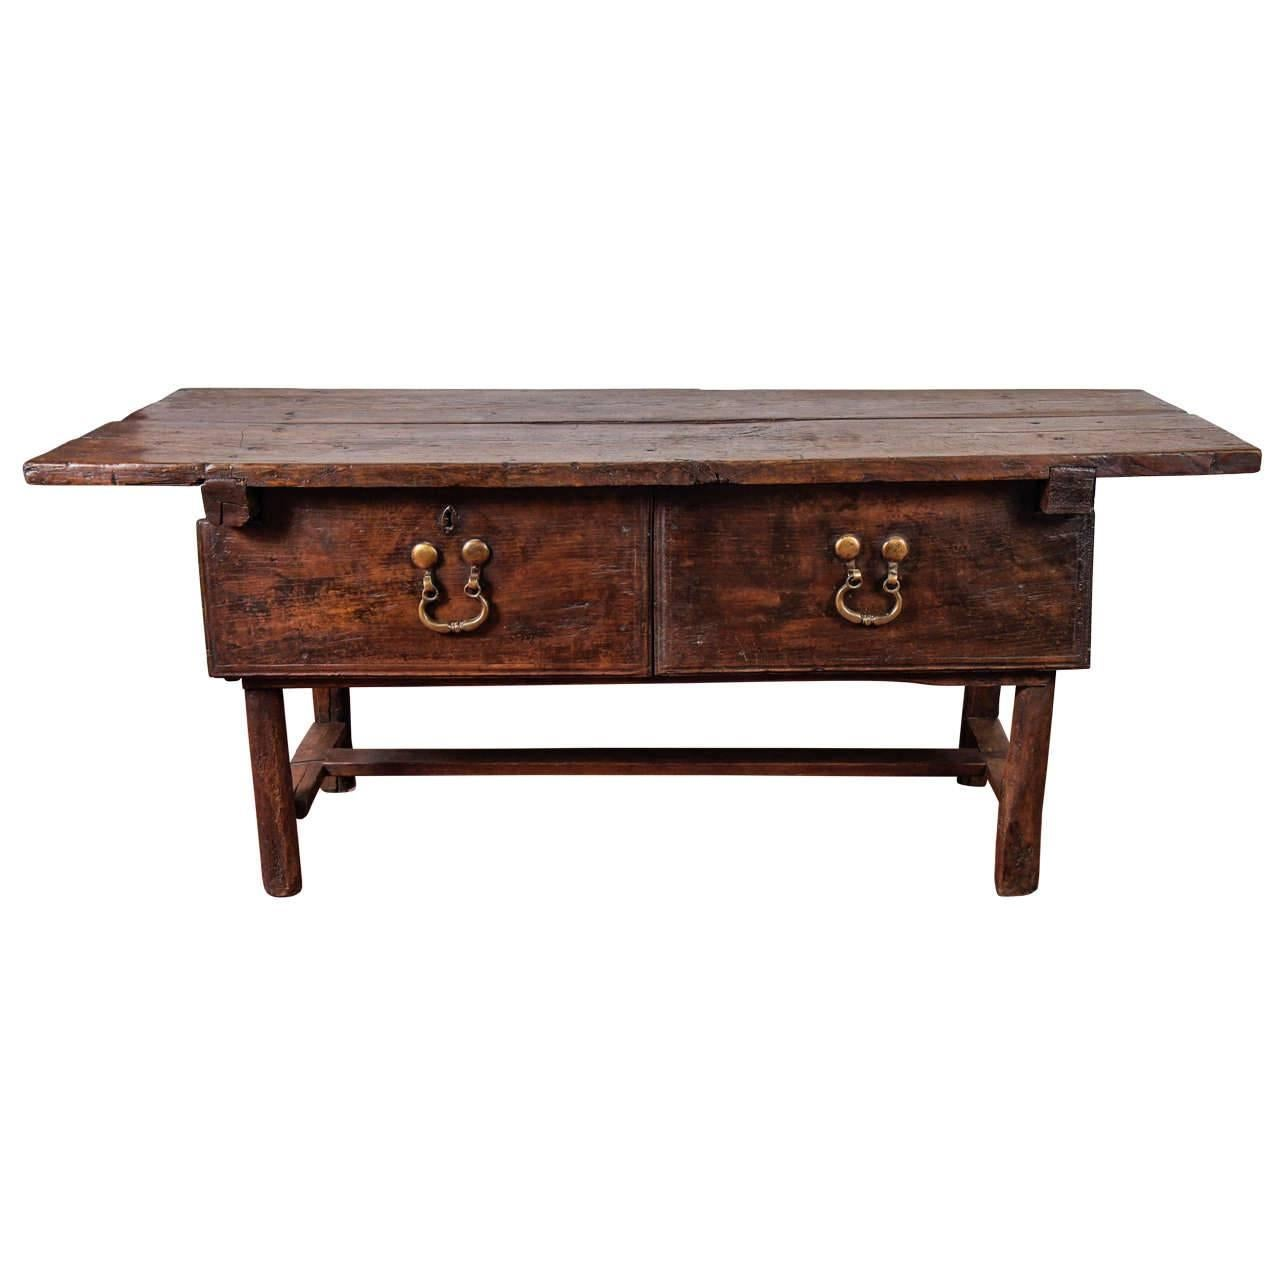 18th Century Spanish Work Table